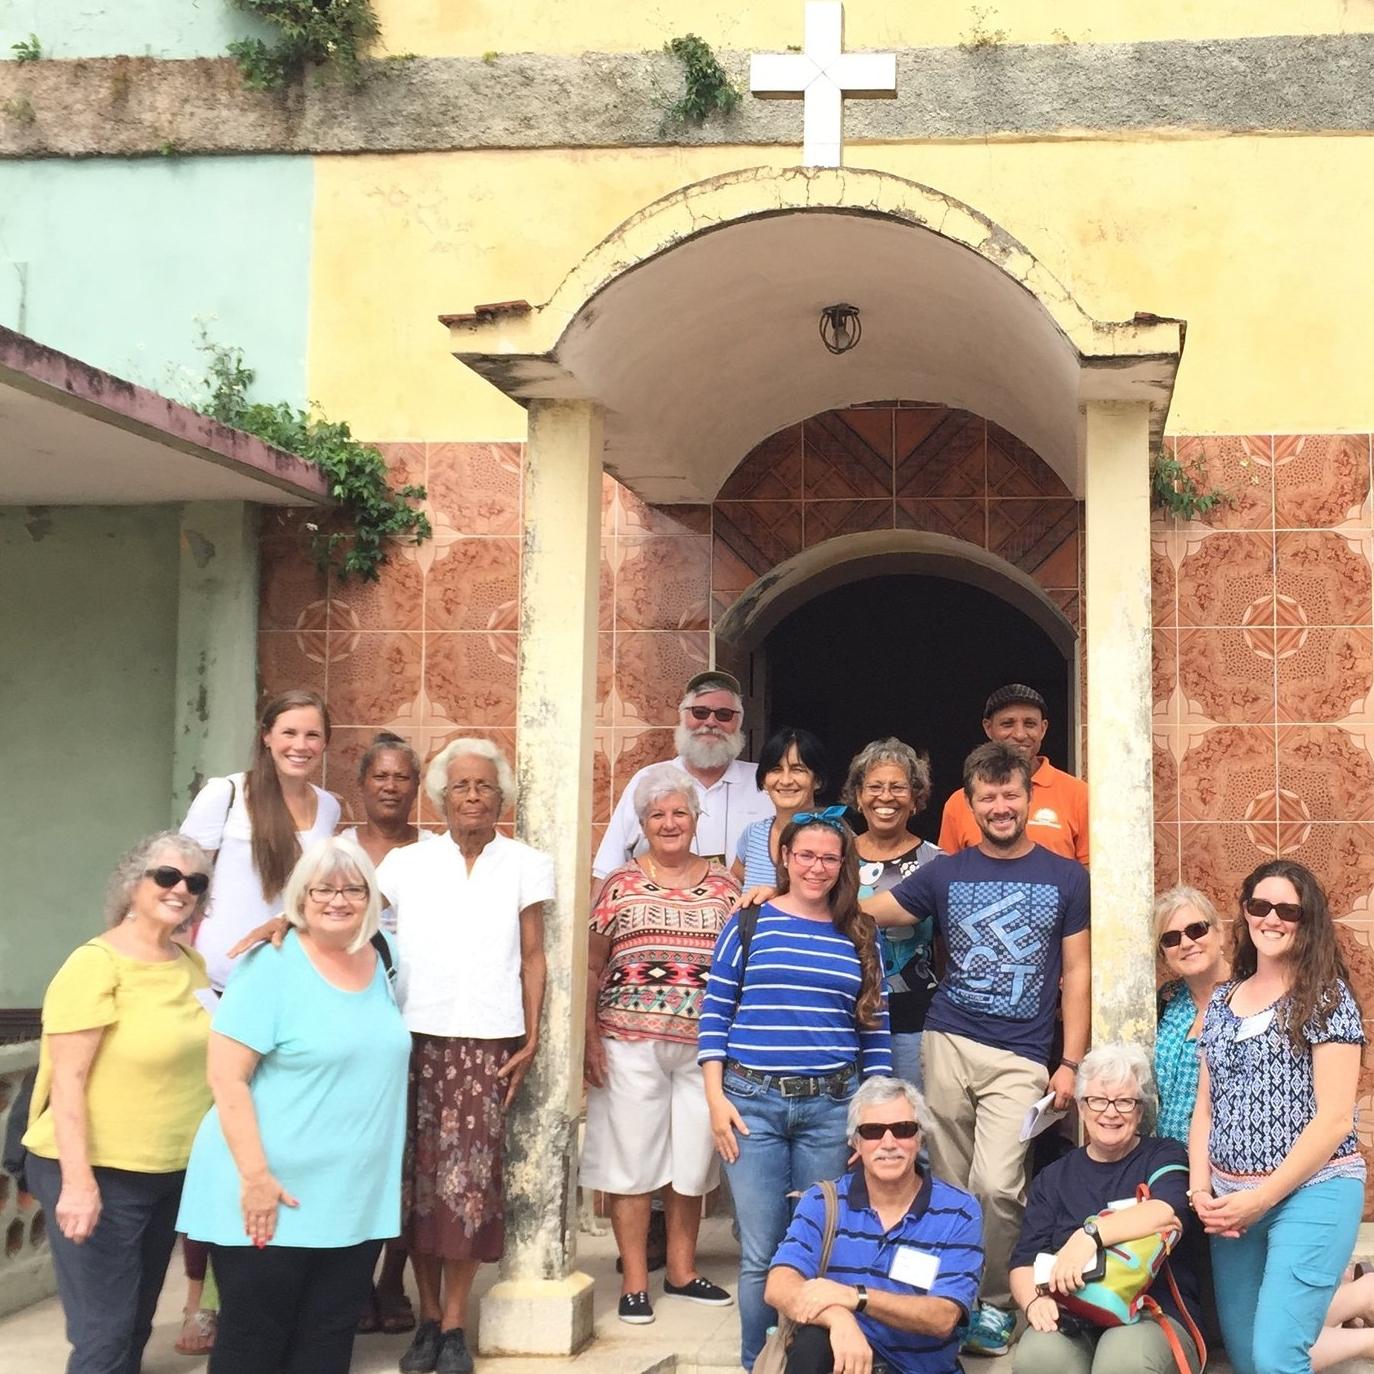 Outreach team on the steps of the Resurrection Church in Sabanilla